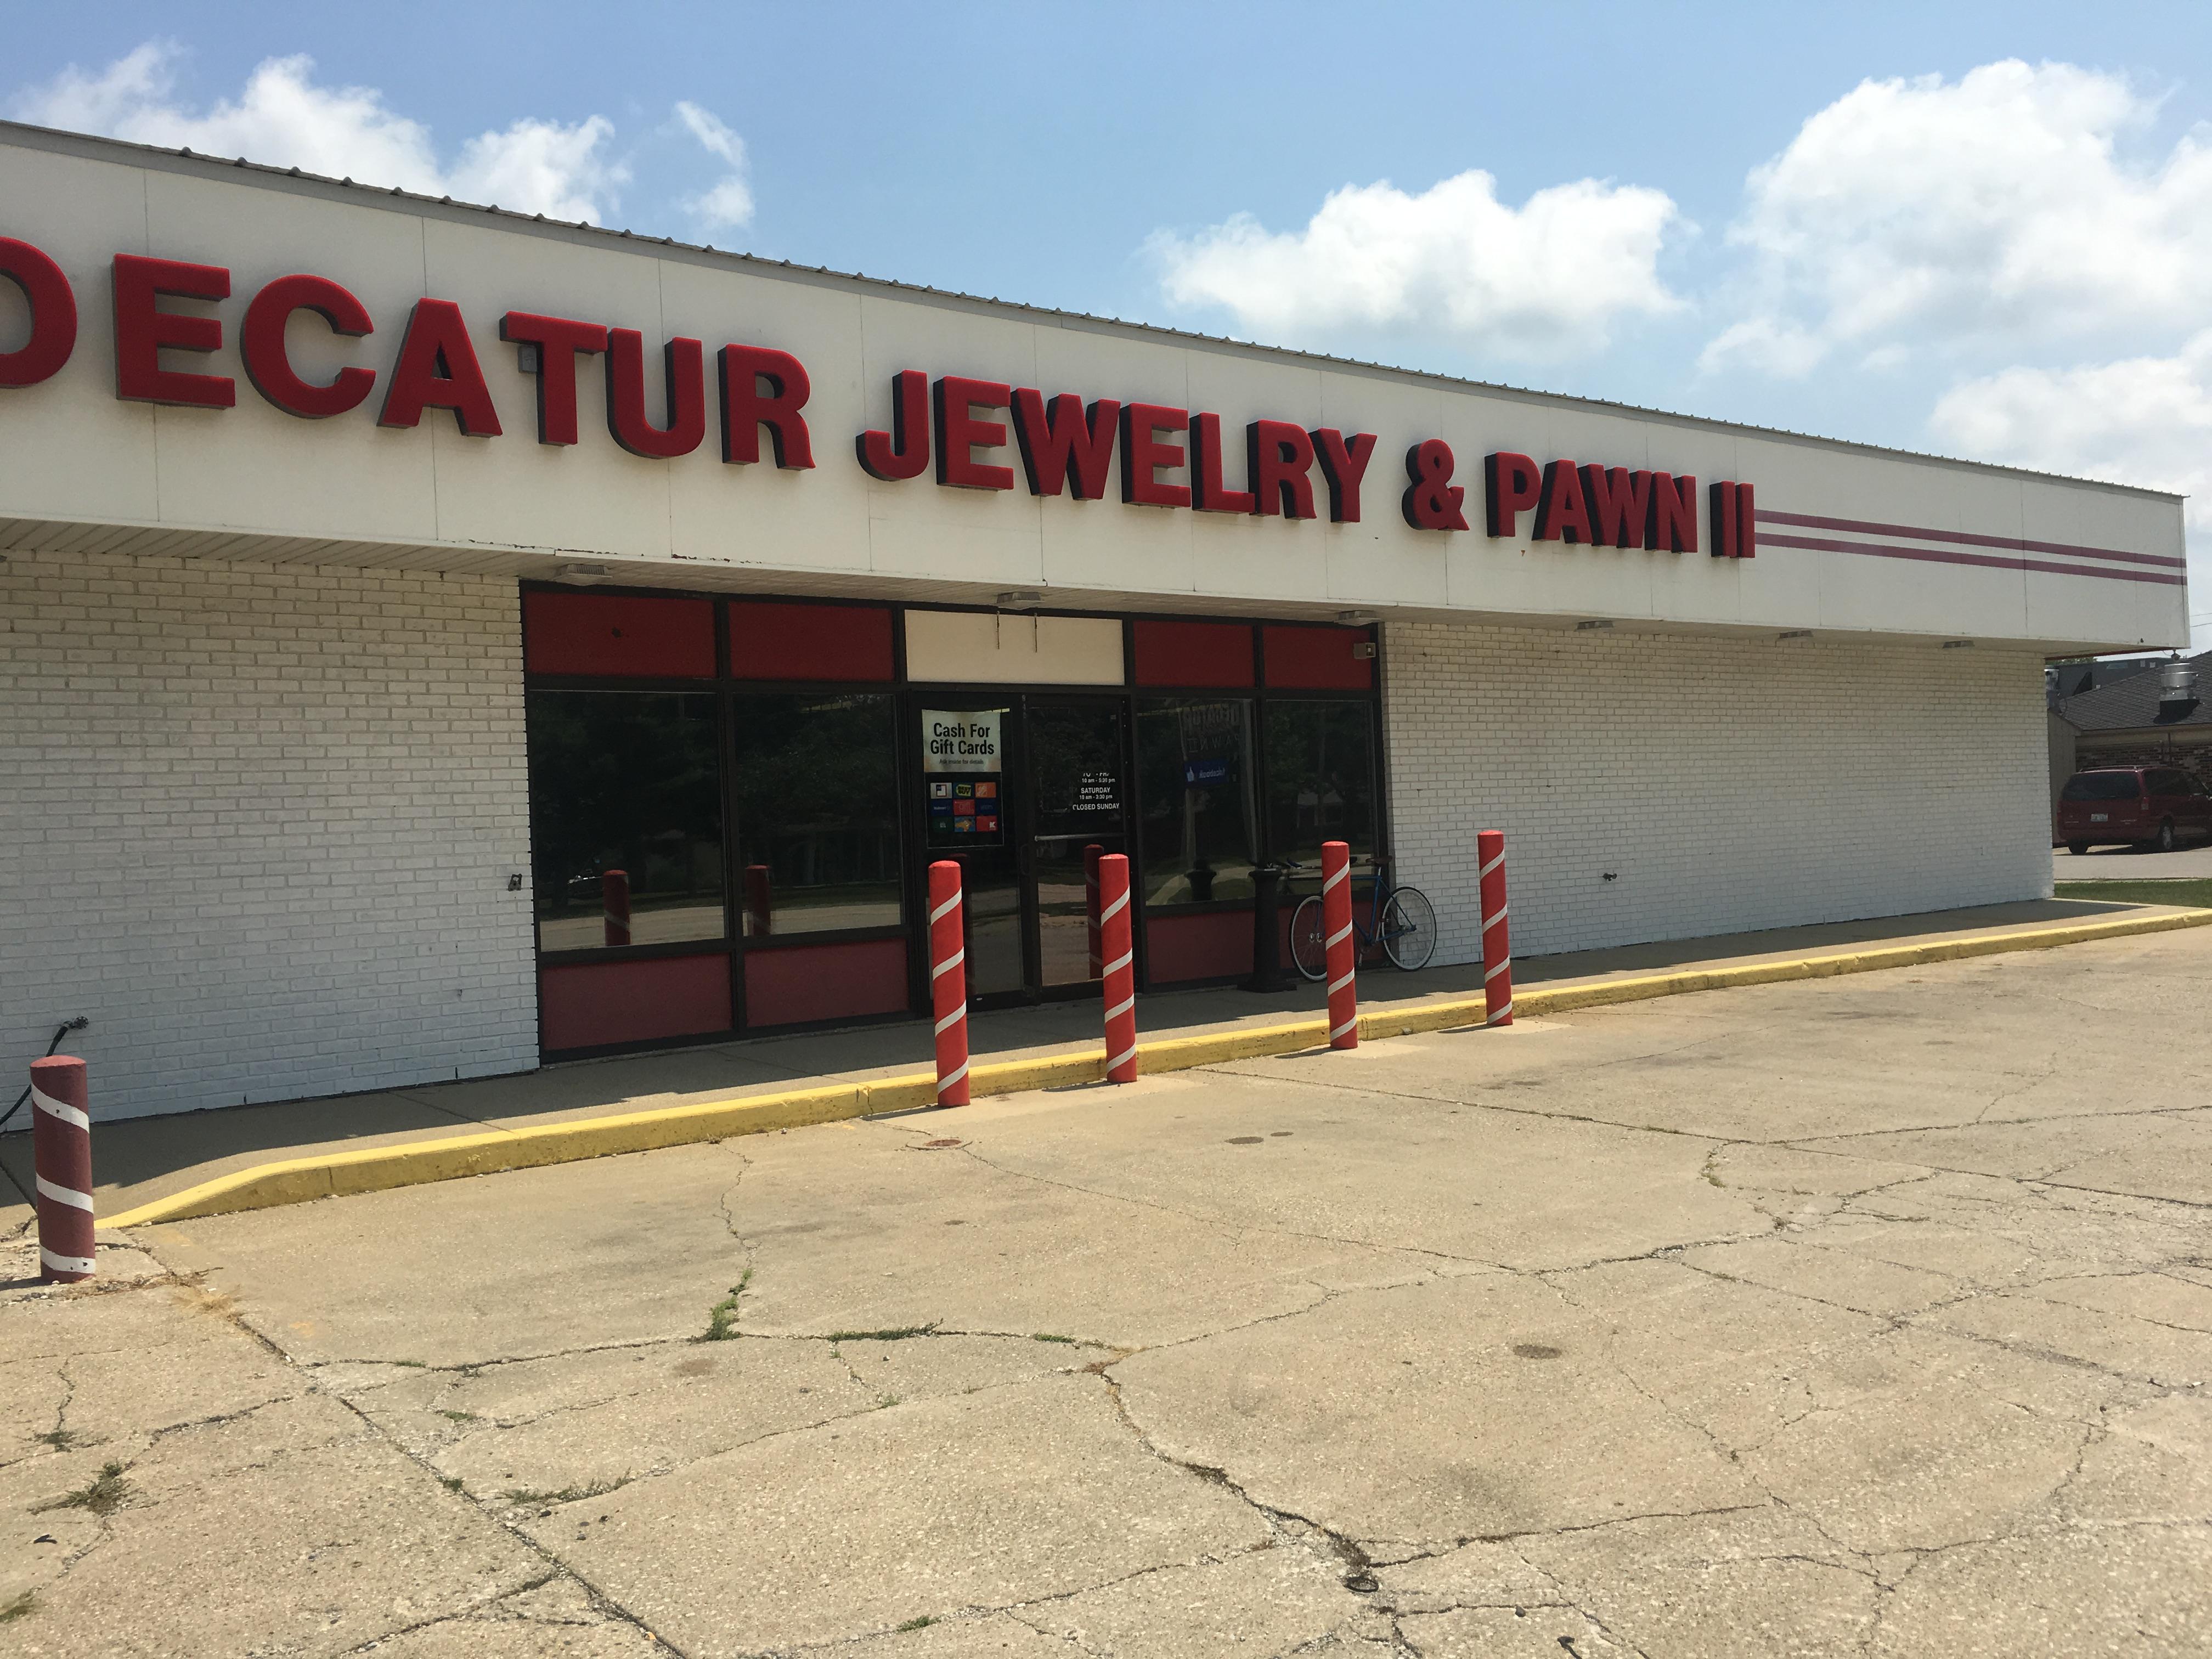 Decatur Jewelry & Pawn